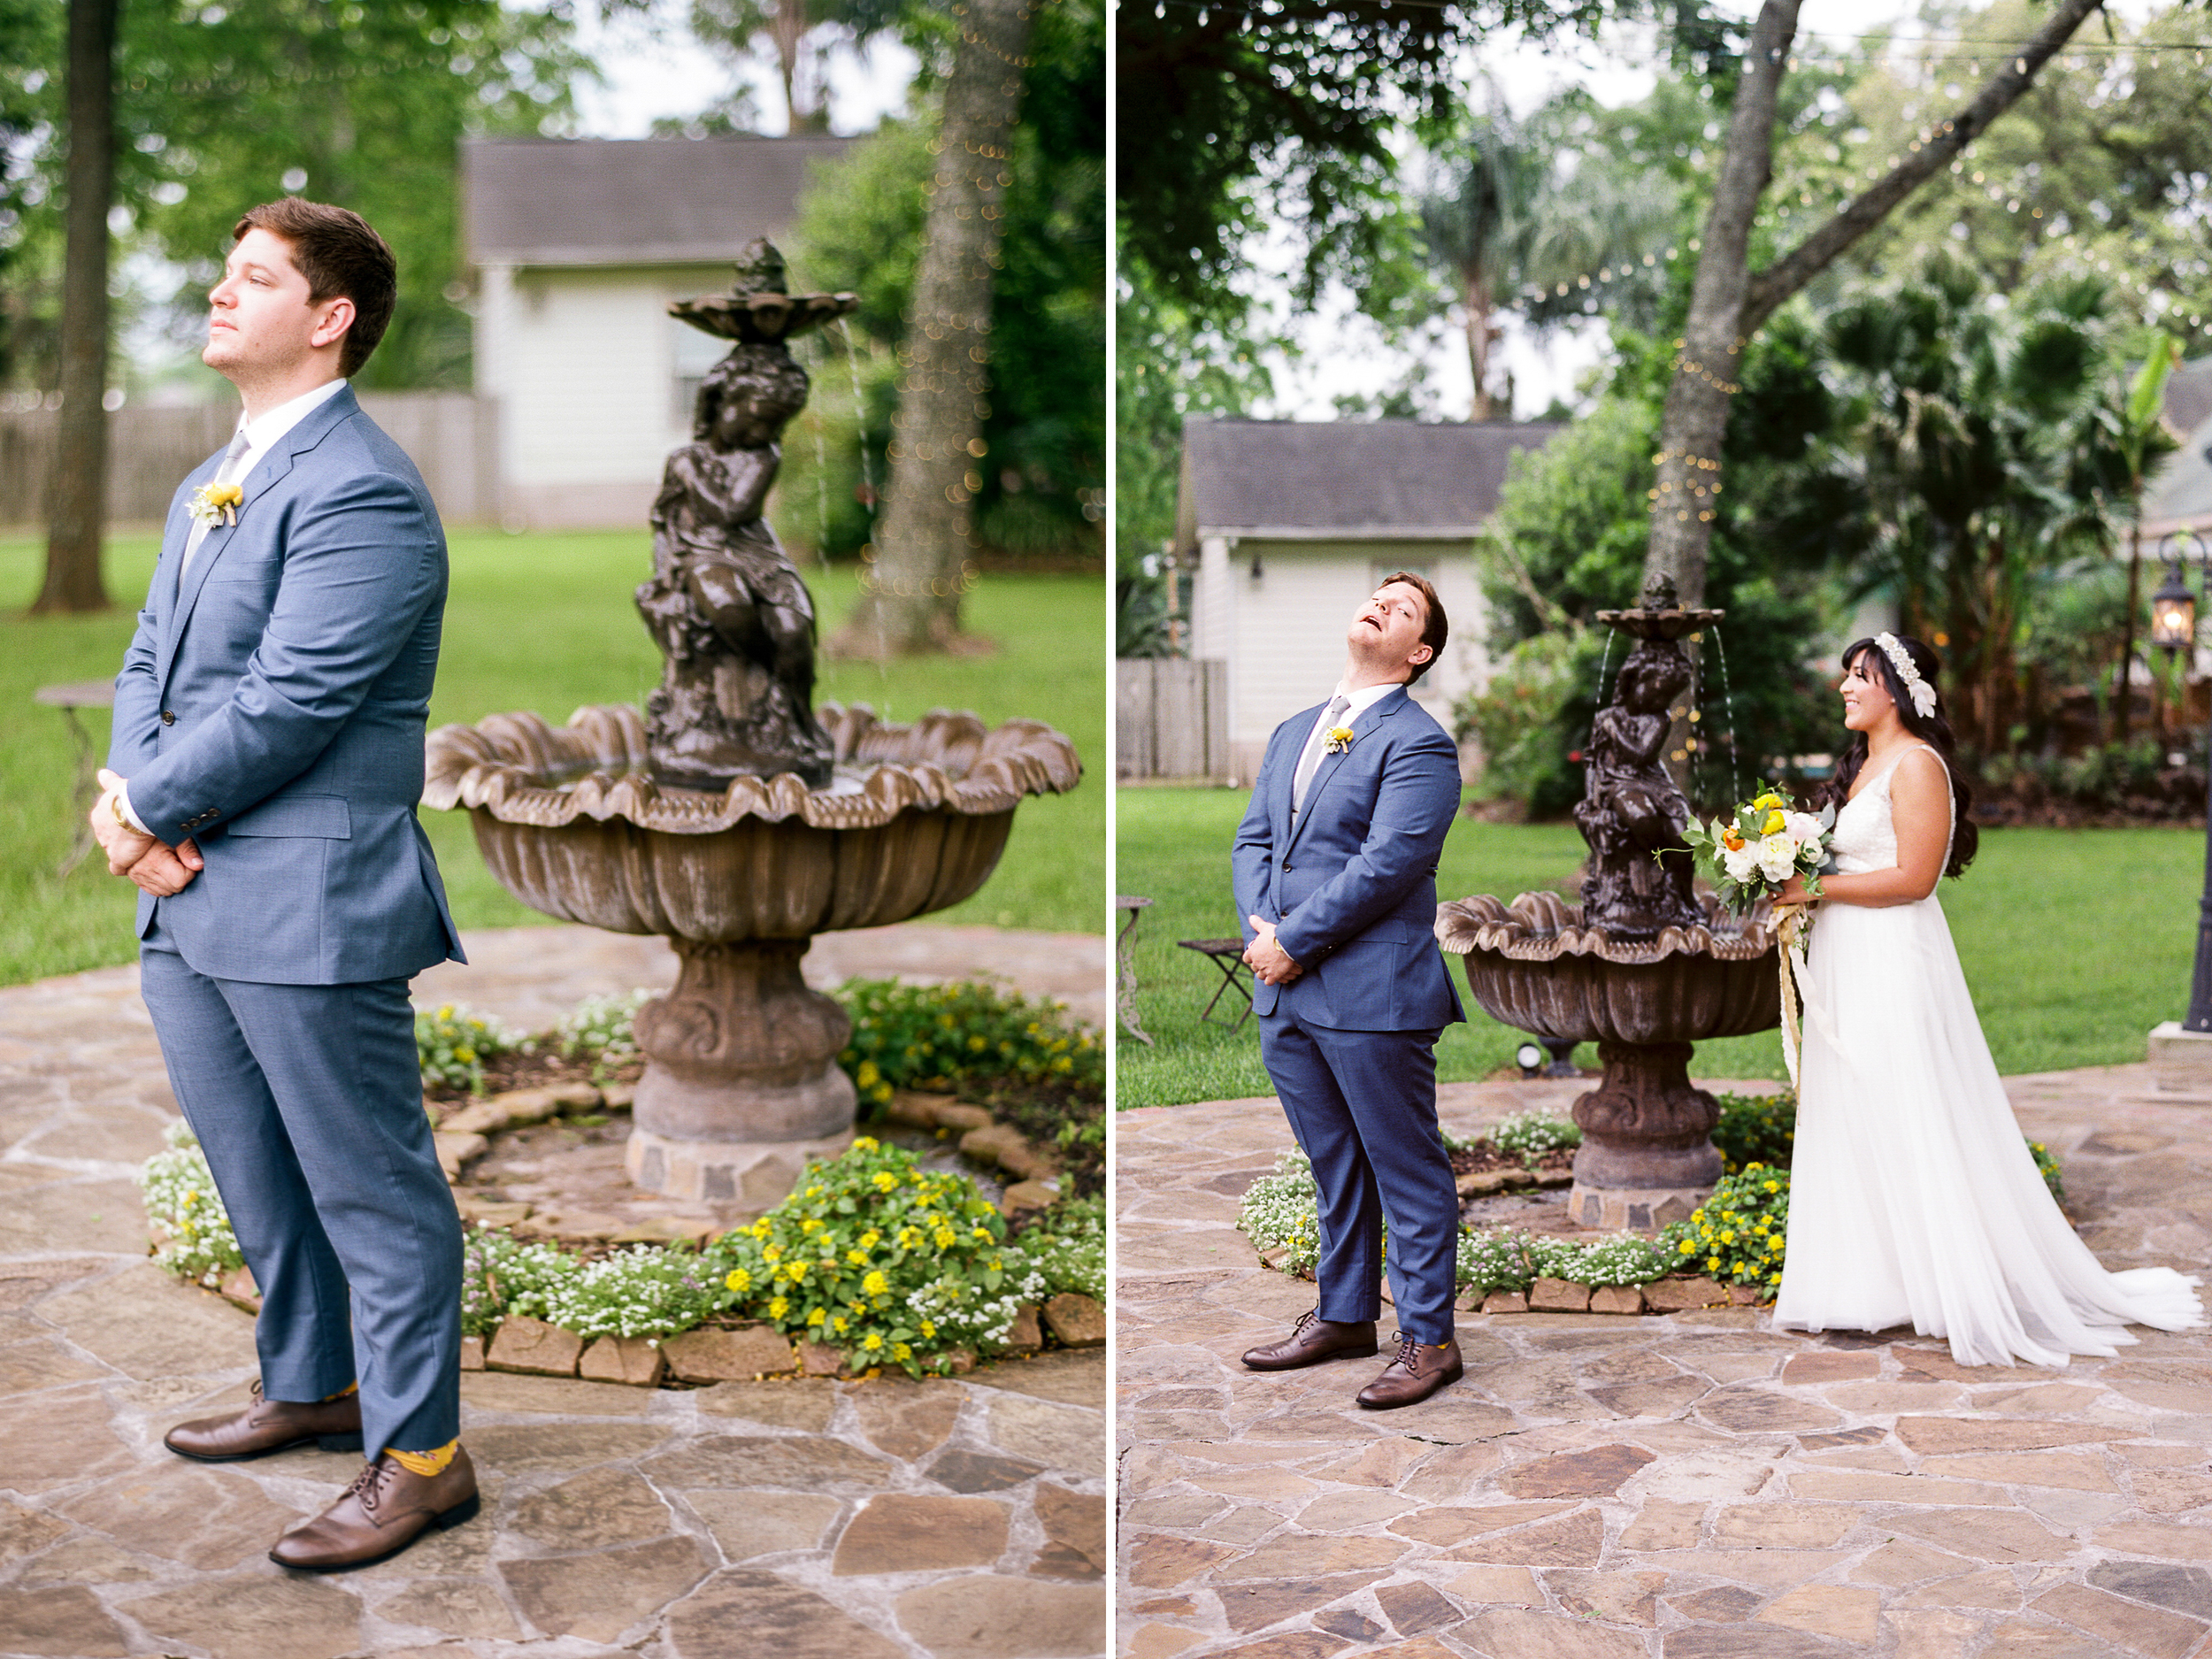 Dana Fernandez Photography Houston Texas Destination Photographer Film Ruffled Blog Wedding Bridal First Look Featured Photography Oak Tree Manor Houston-200.jpg